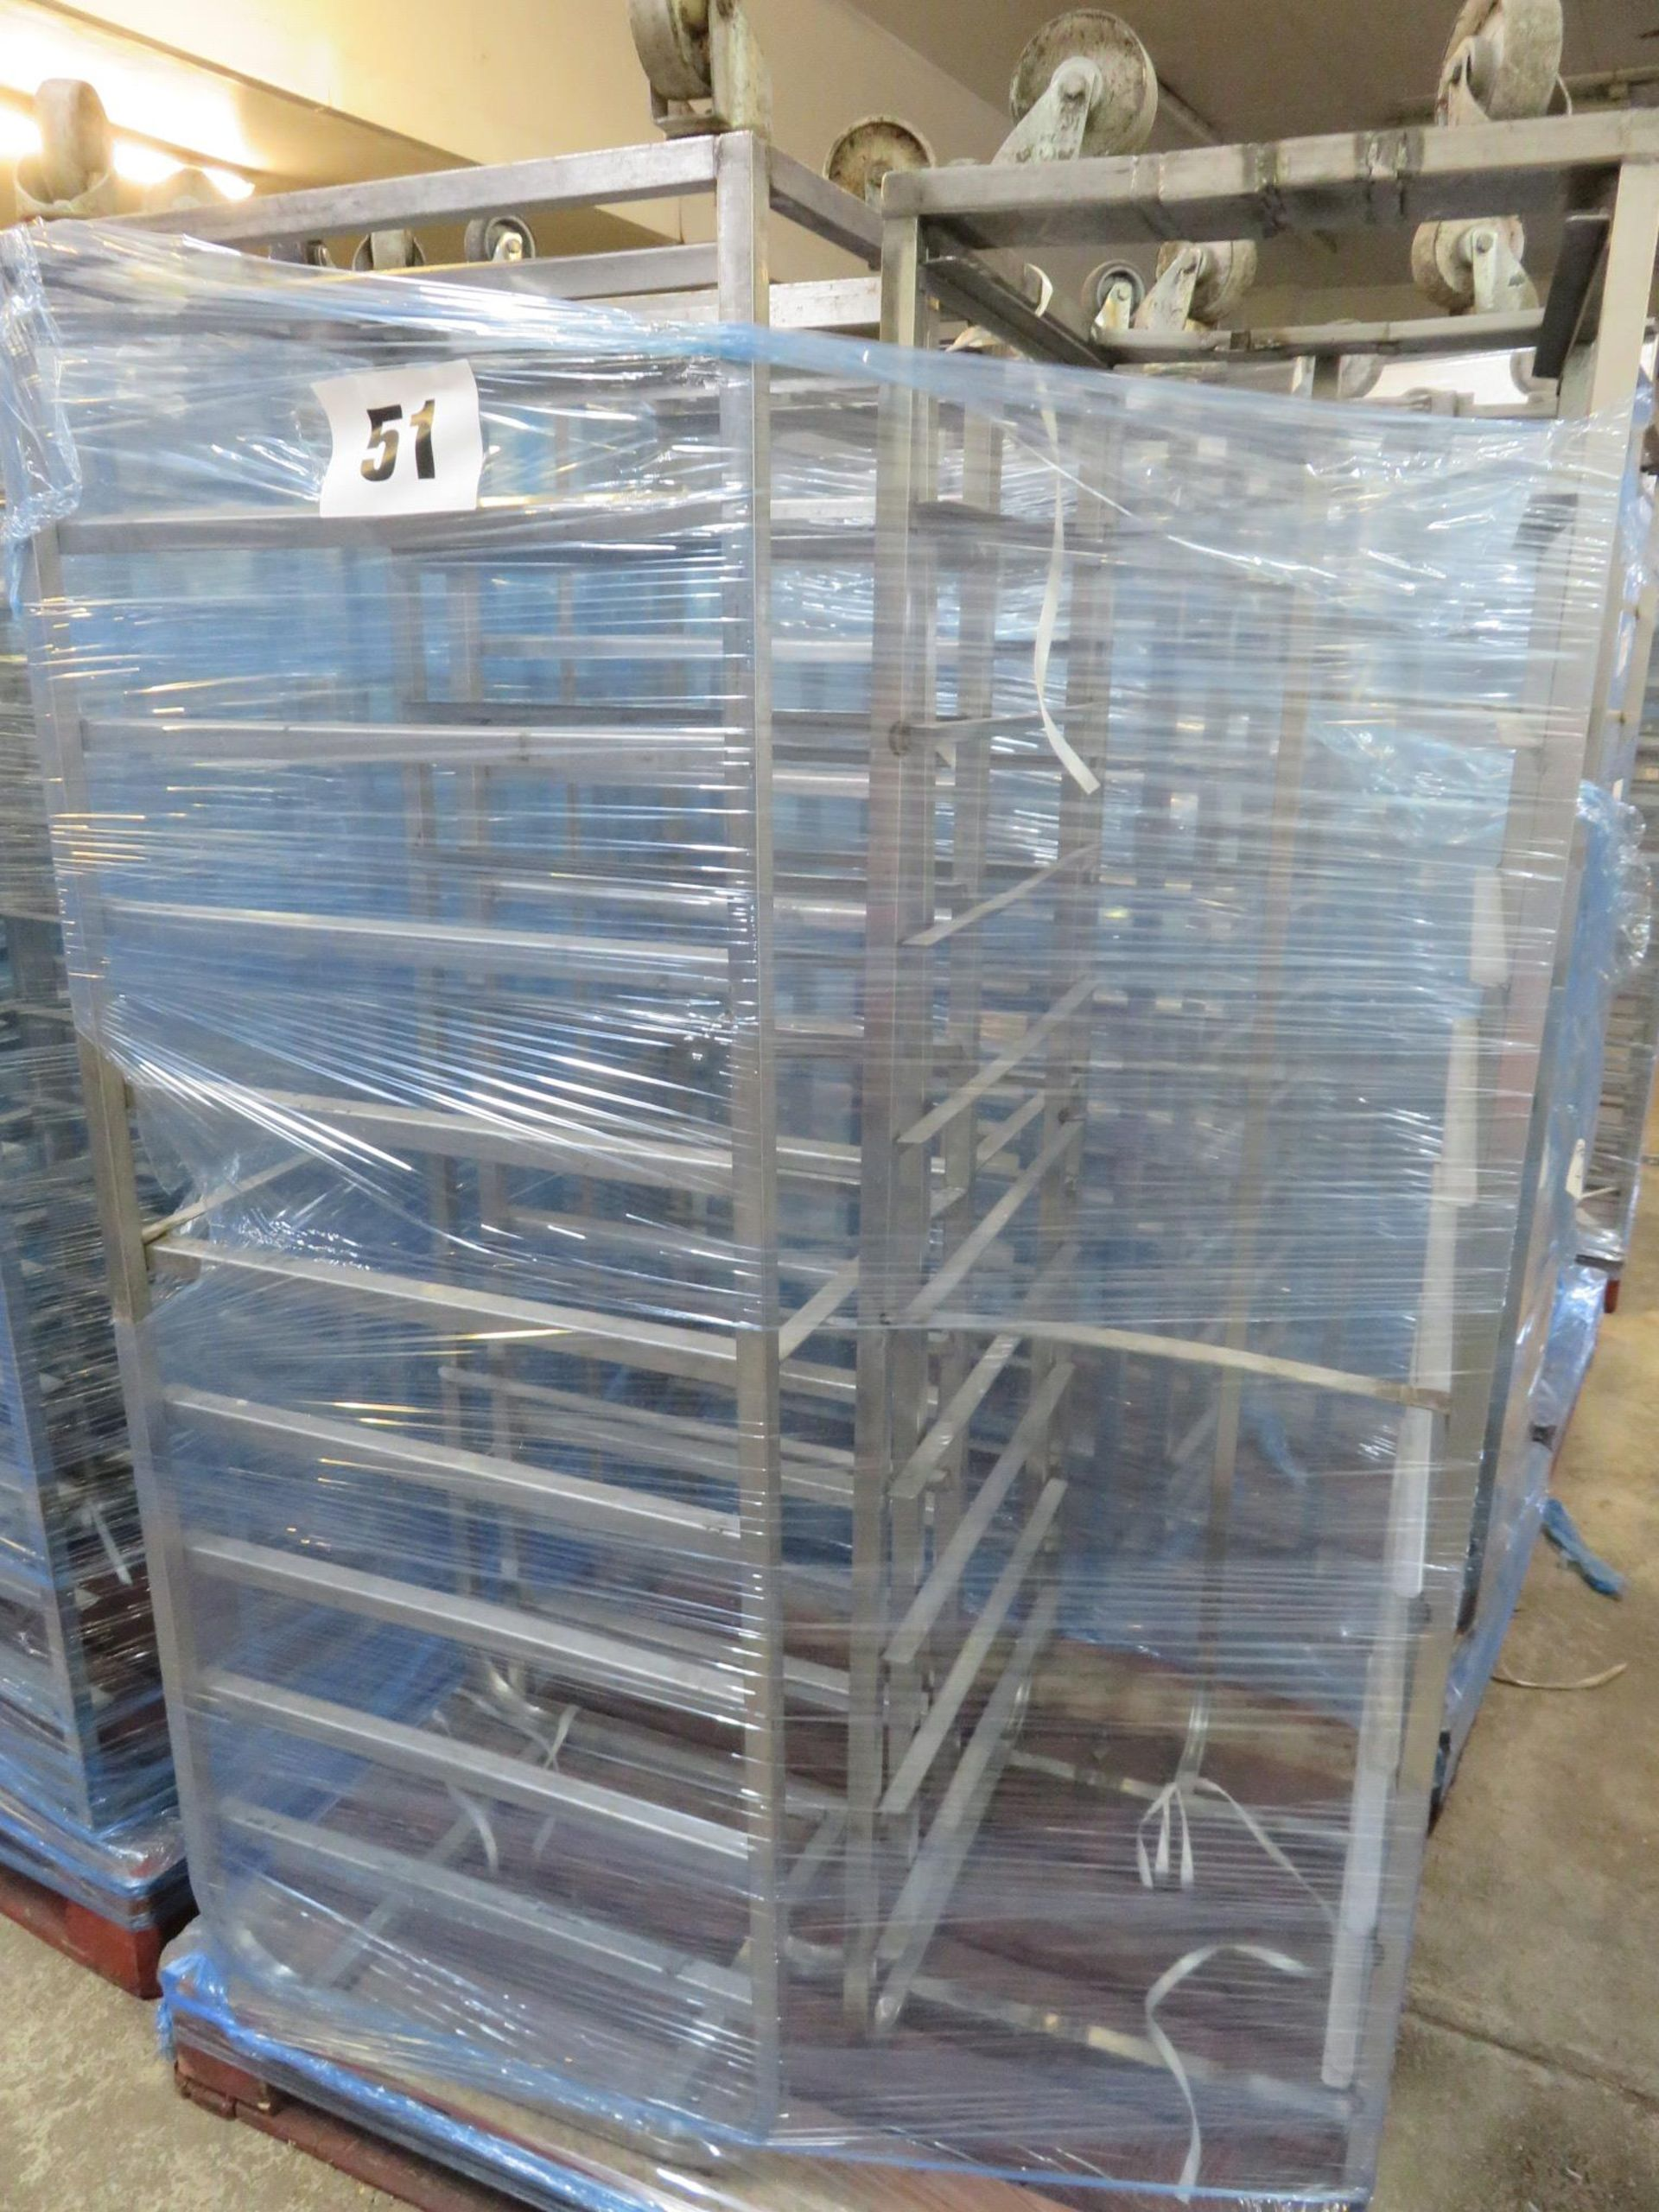 Lot 51 - 3 x S/s Racks:- 2x S/s Racks capable of taking 10 trays.Approx. 430 x 650 x 1800mm high.LO£20